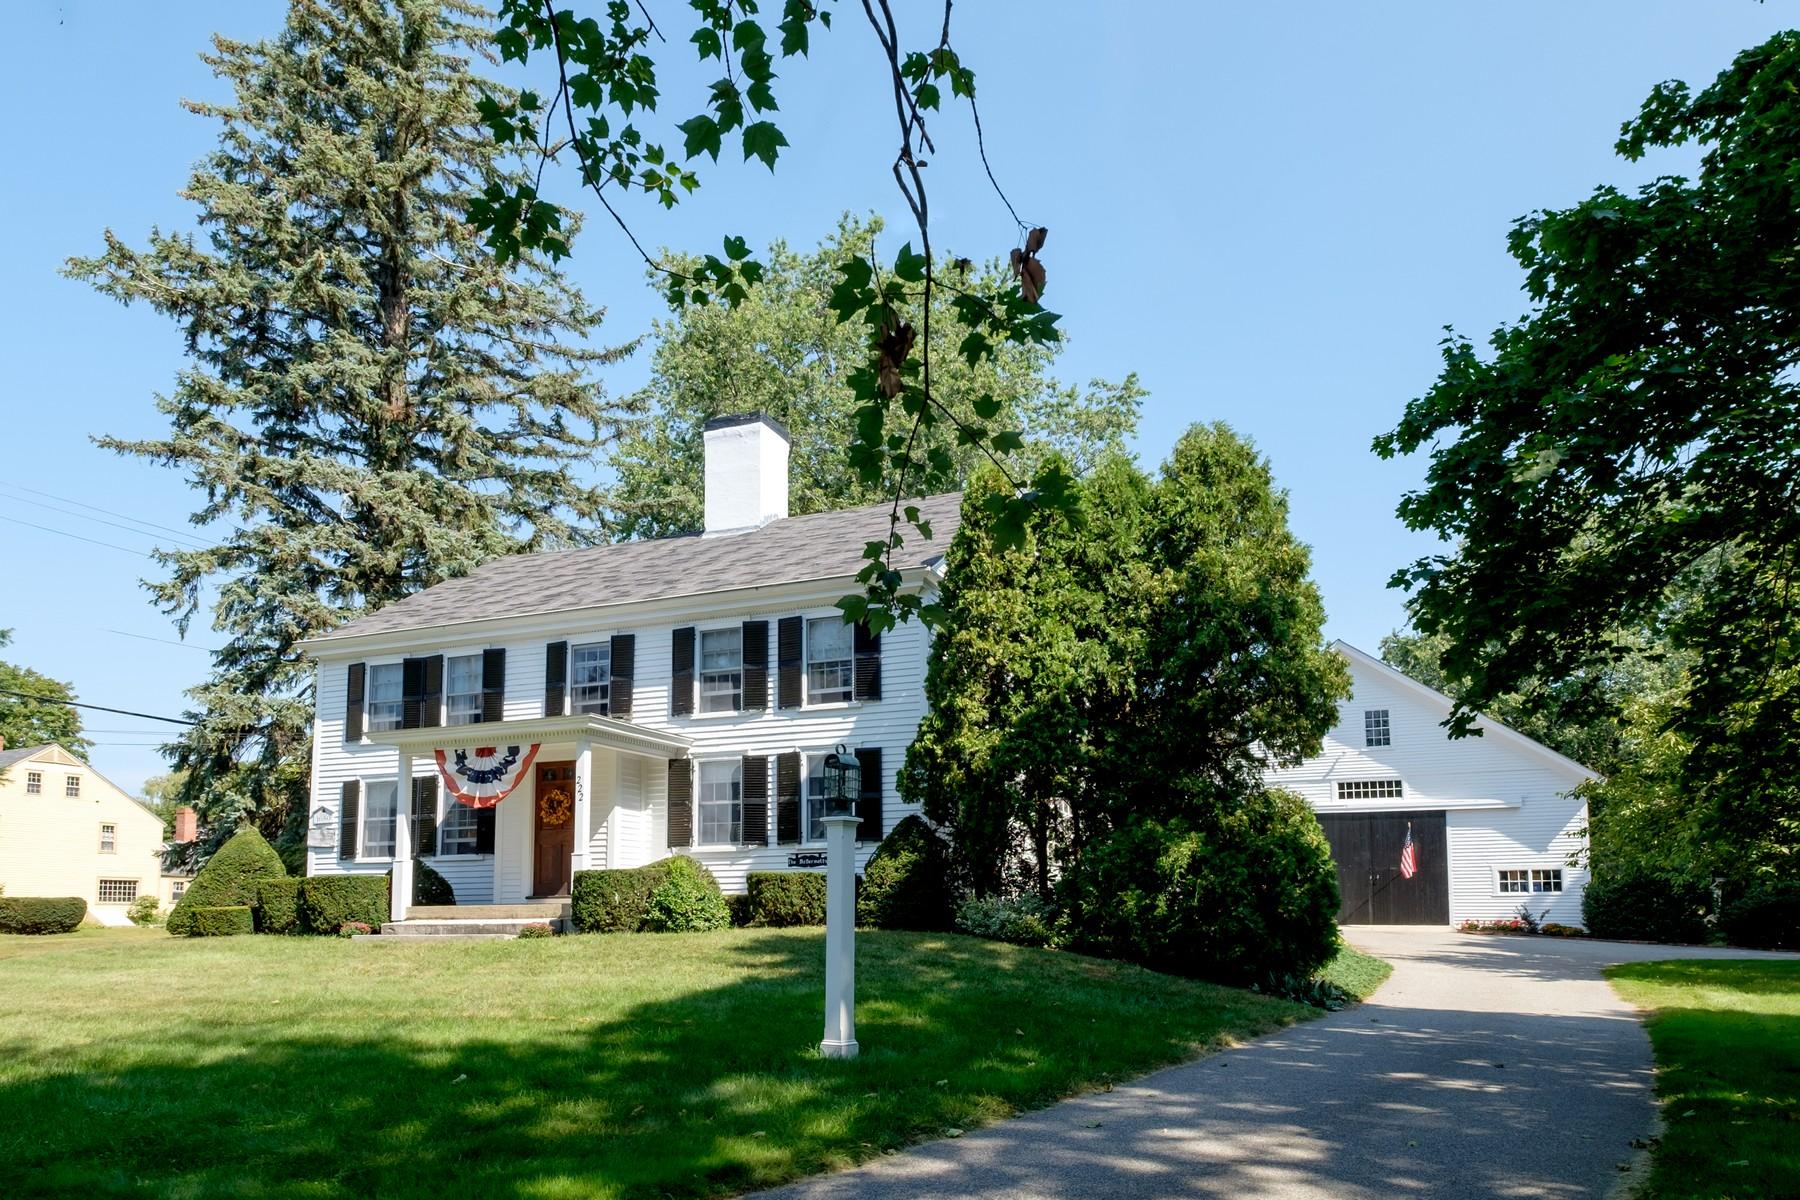 Single Family Home for Sale at Historic John Moulton Homestead Circa 1650 222 Winnacunnet Road Hampton, New Hampshire, 03842 United States